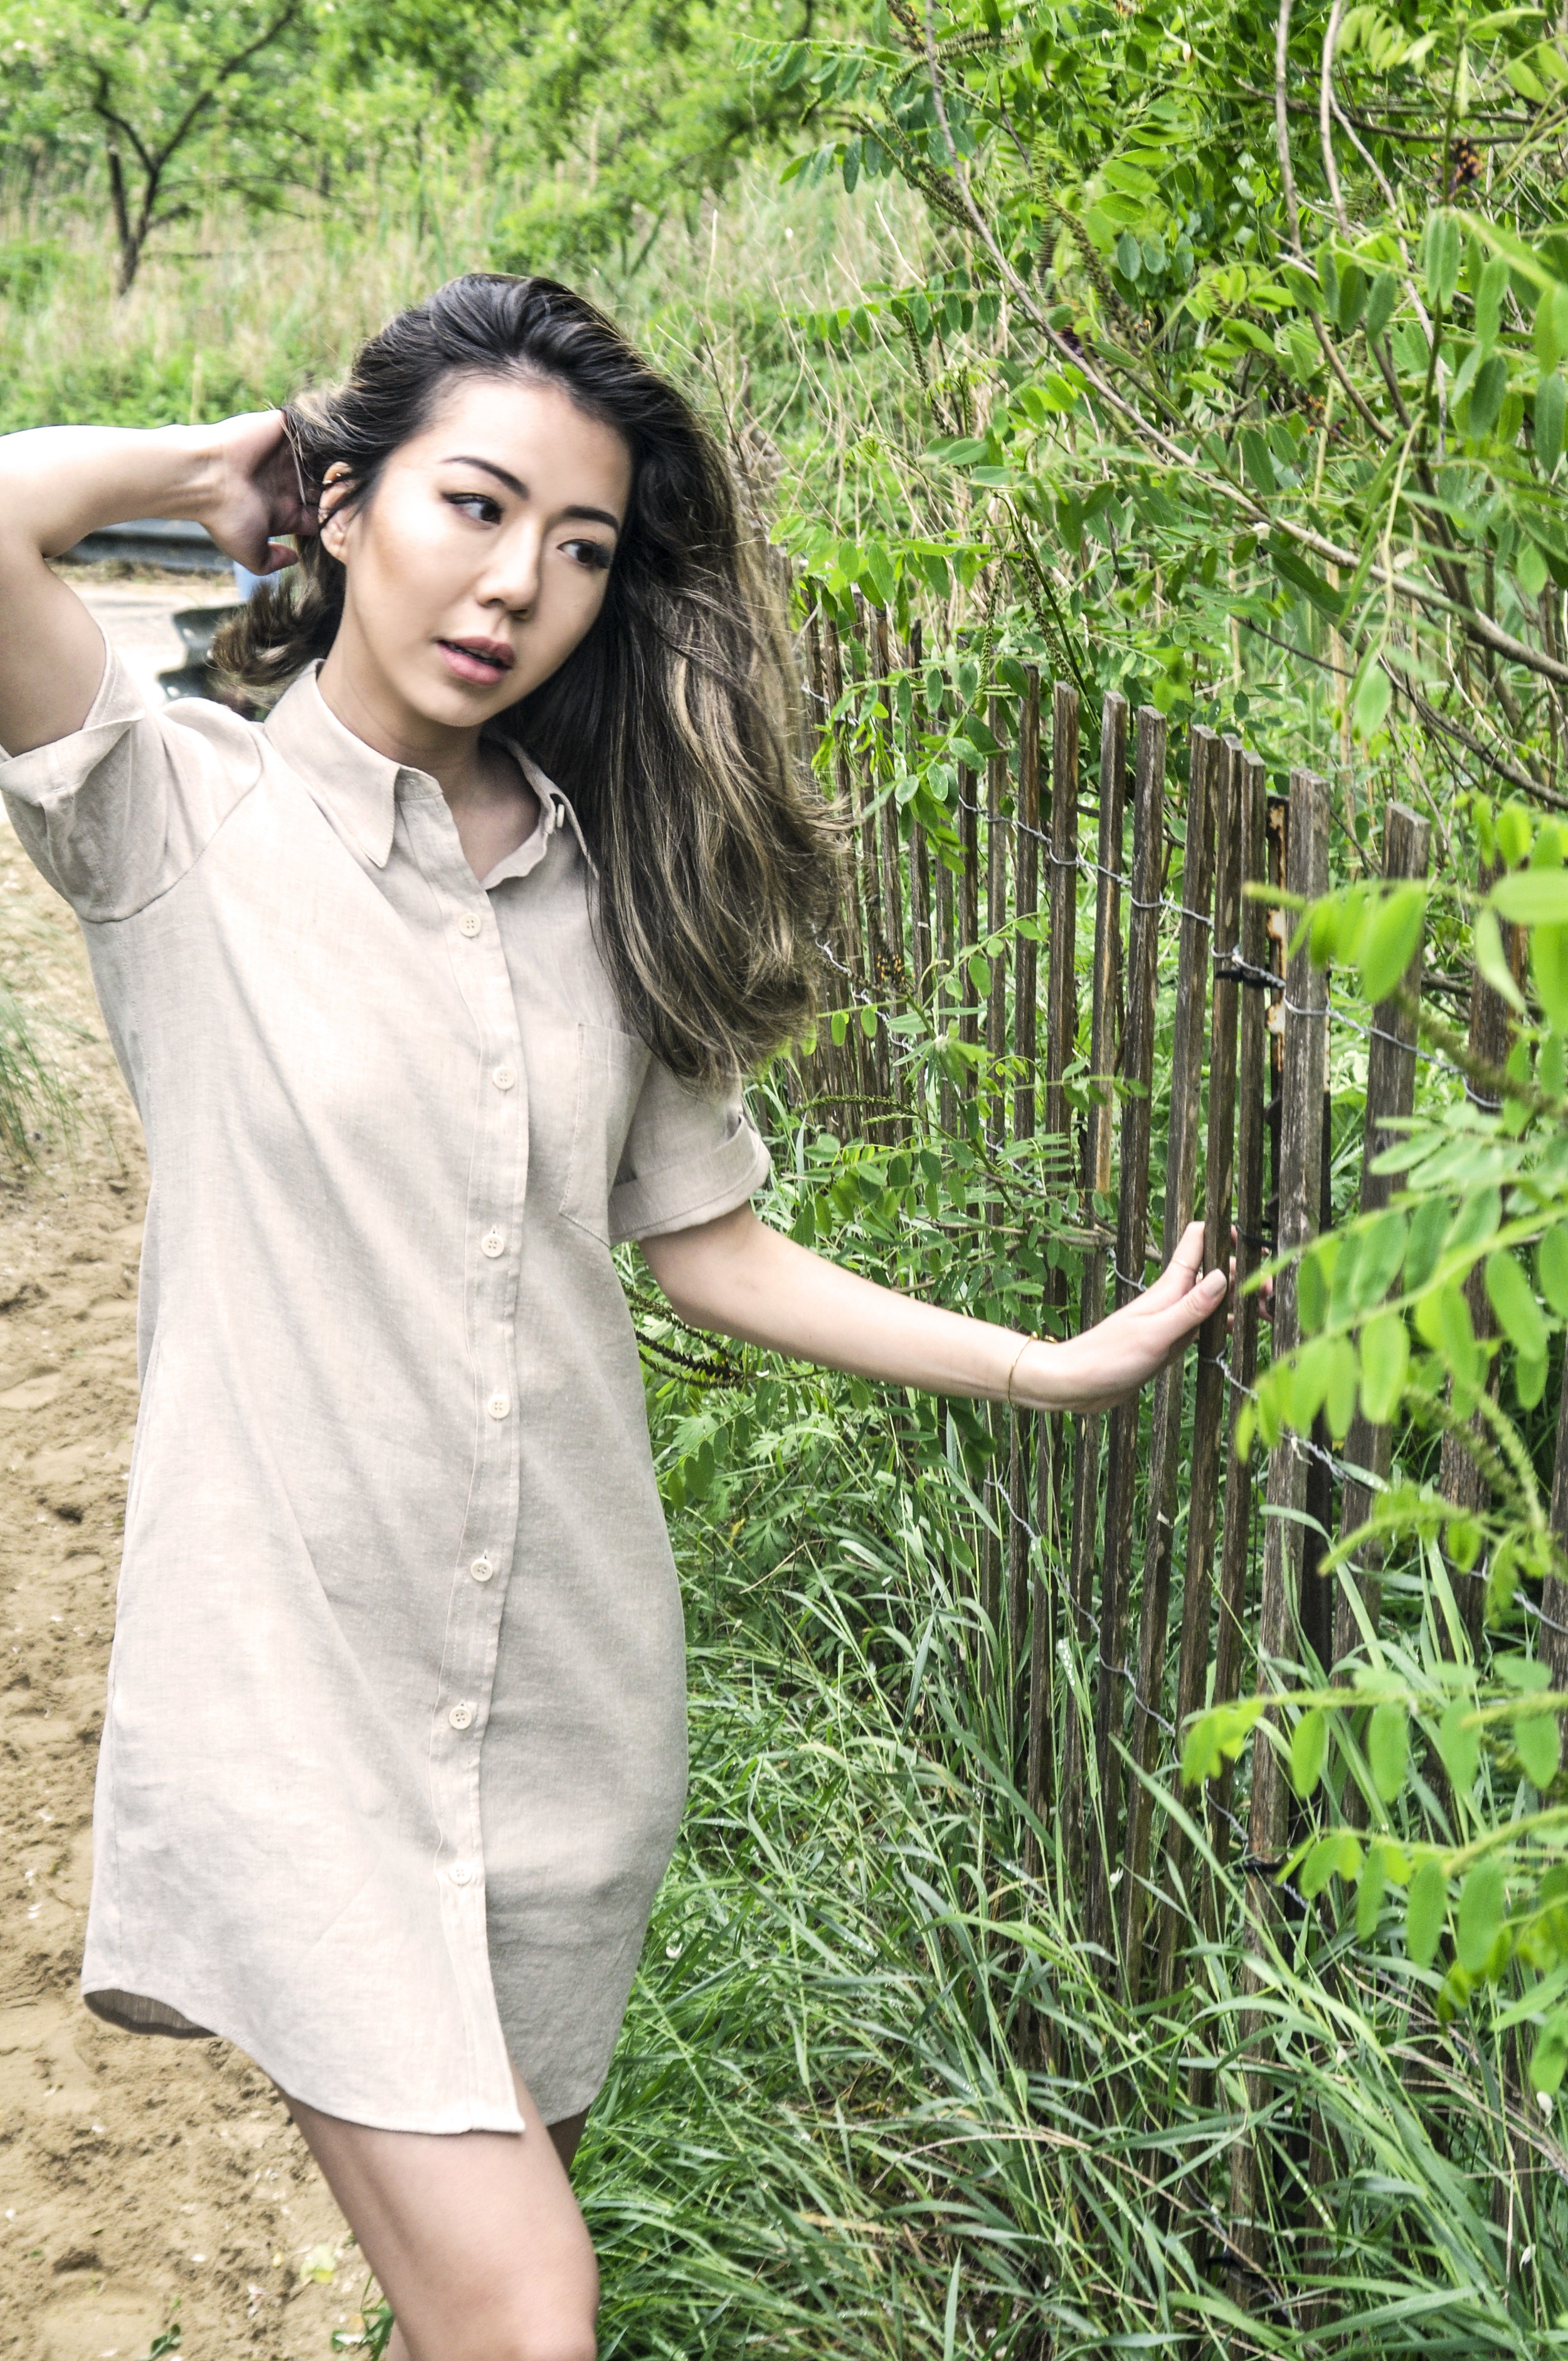 The Iconic Shirtdress - 06.07.18